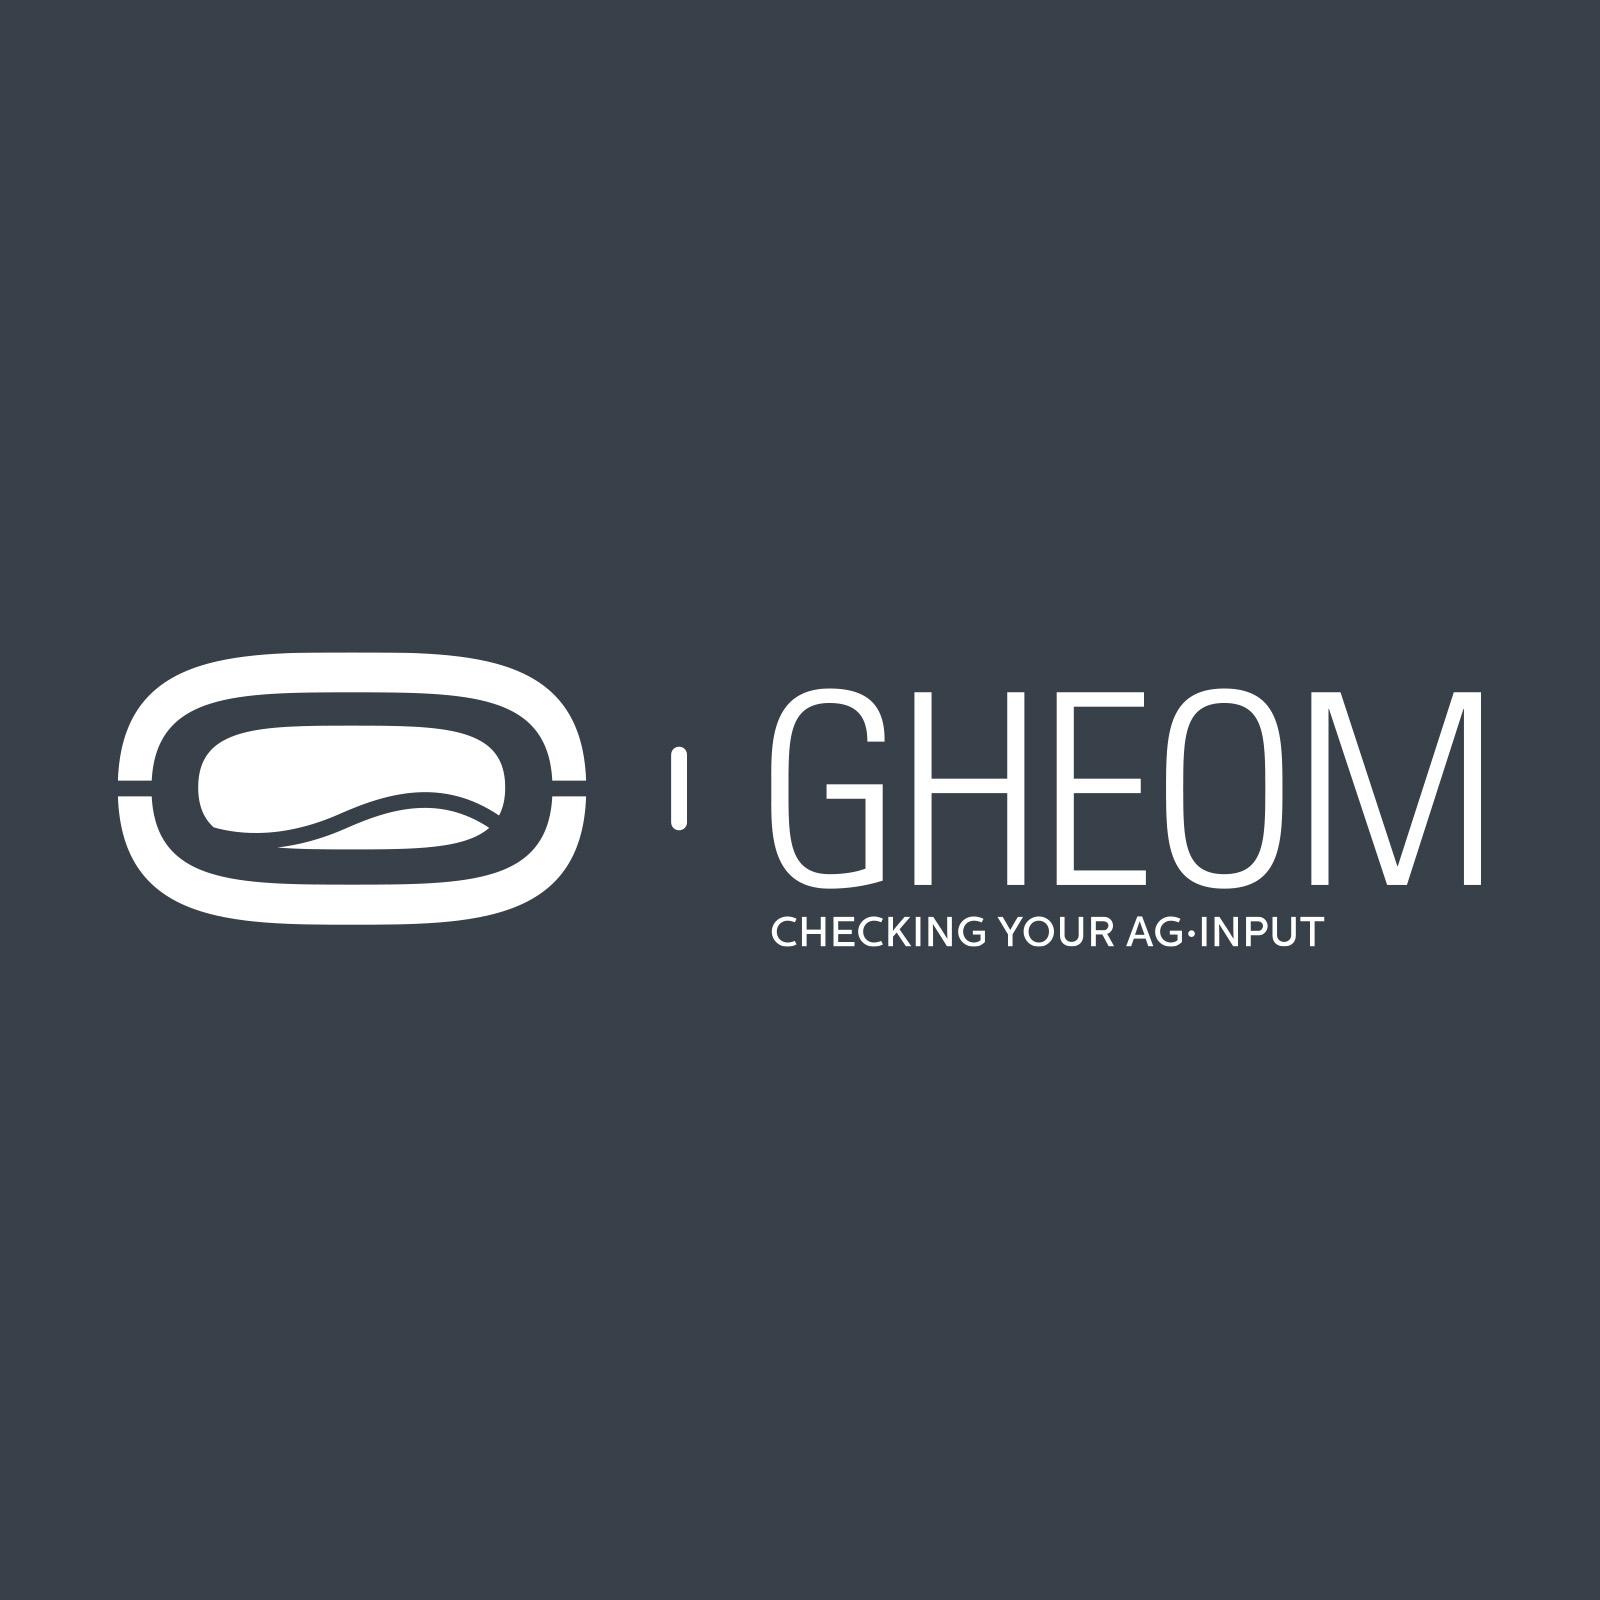 Gheom1.jpg